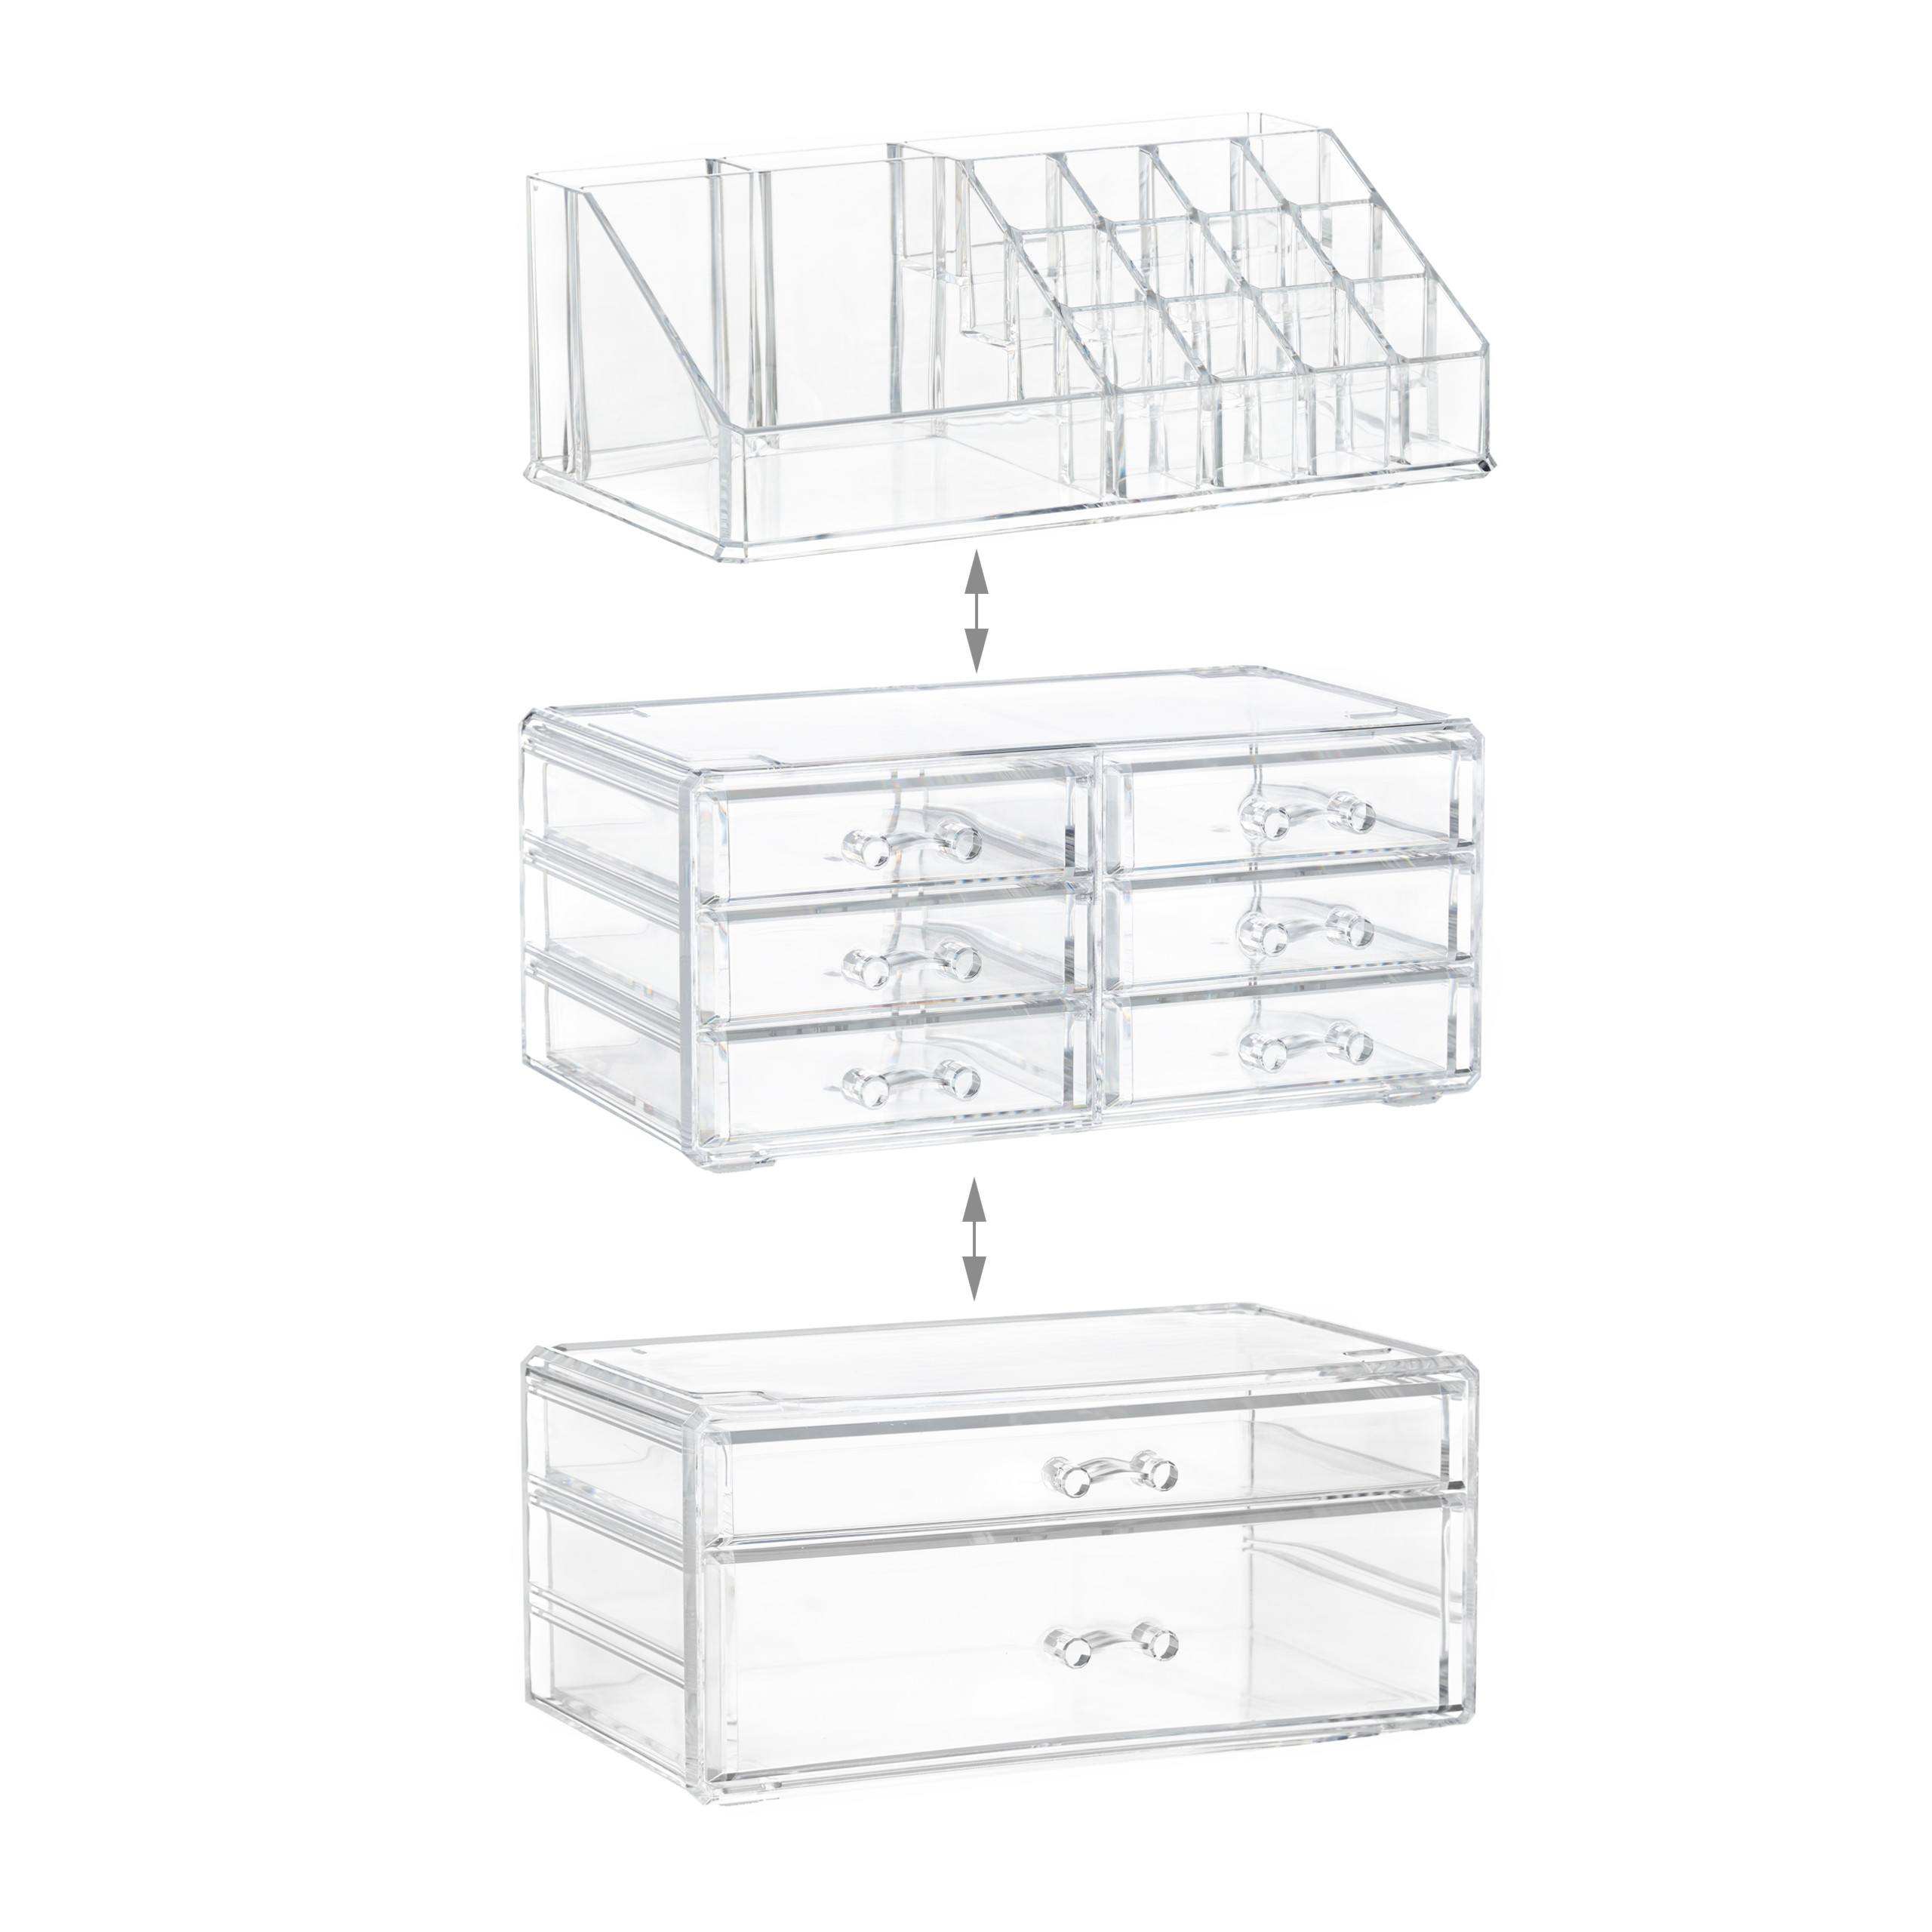 make-up-organizer-opbergen-van-cosmetica-acryl-stapelbaar-met-lades miniatuur 6